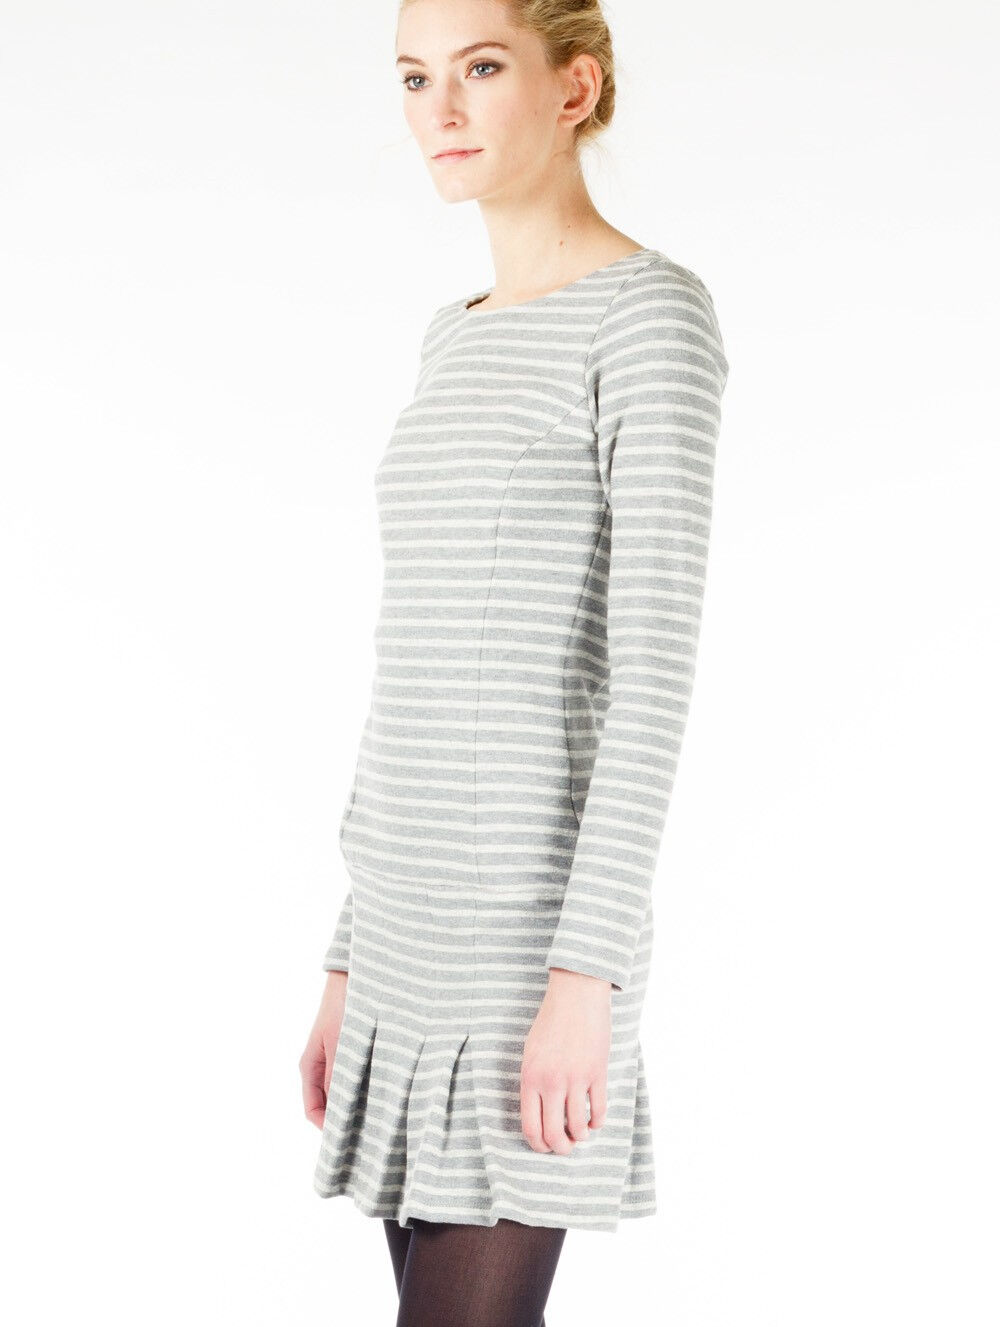 Thomas Sires Striped Sweatshirt Dress size S